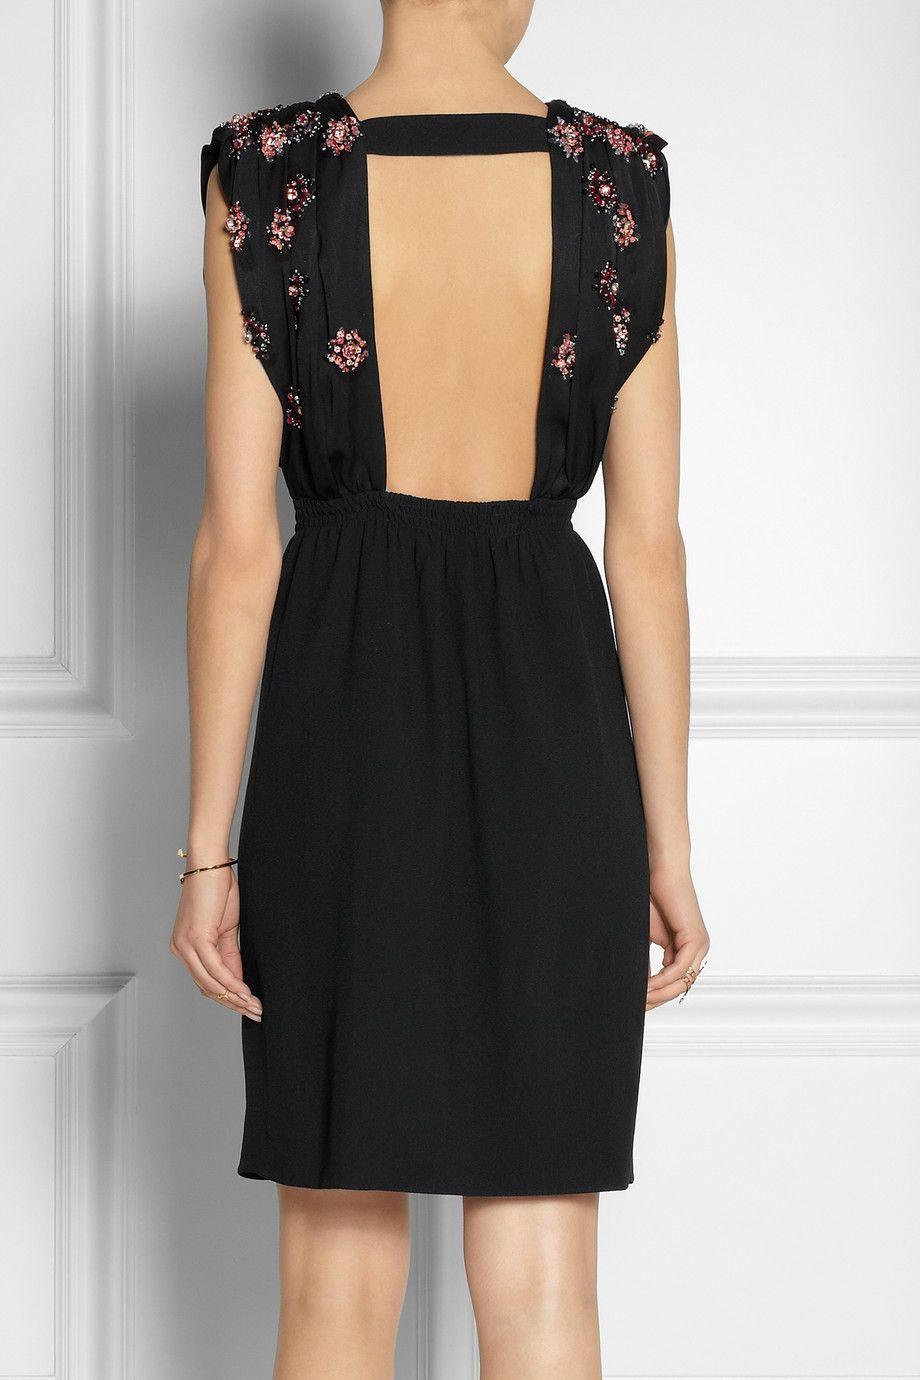 Miu Miu - Embellished open-back crepe dress